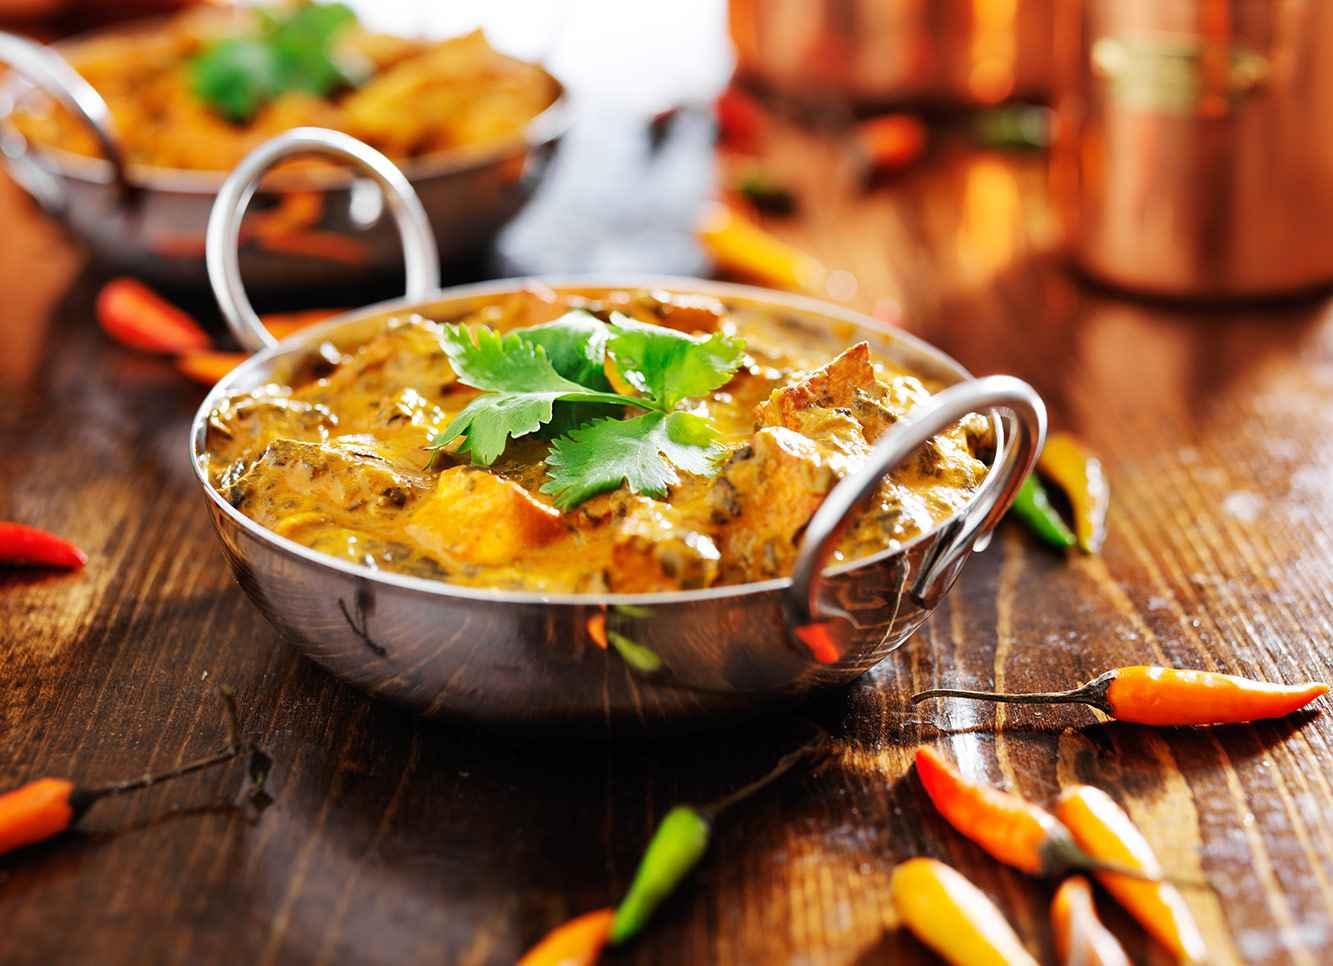 10. Restaurant & Takeaway Bengal Indian Cuisine N8